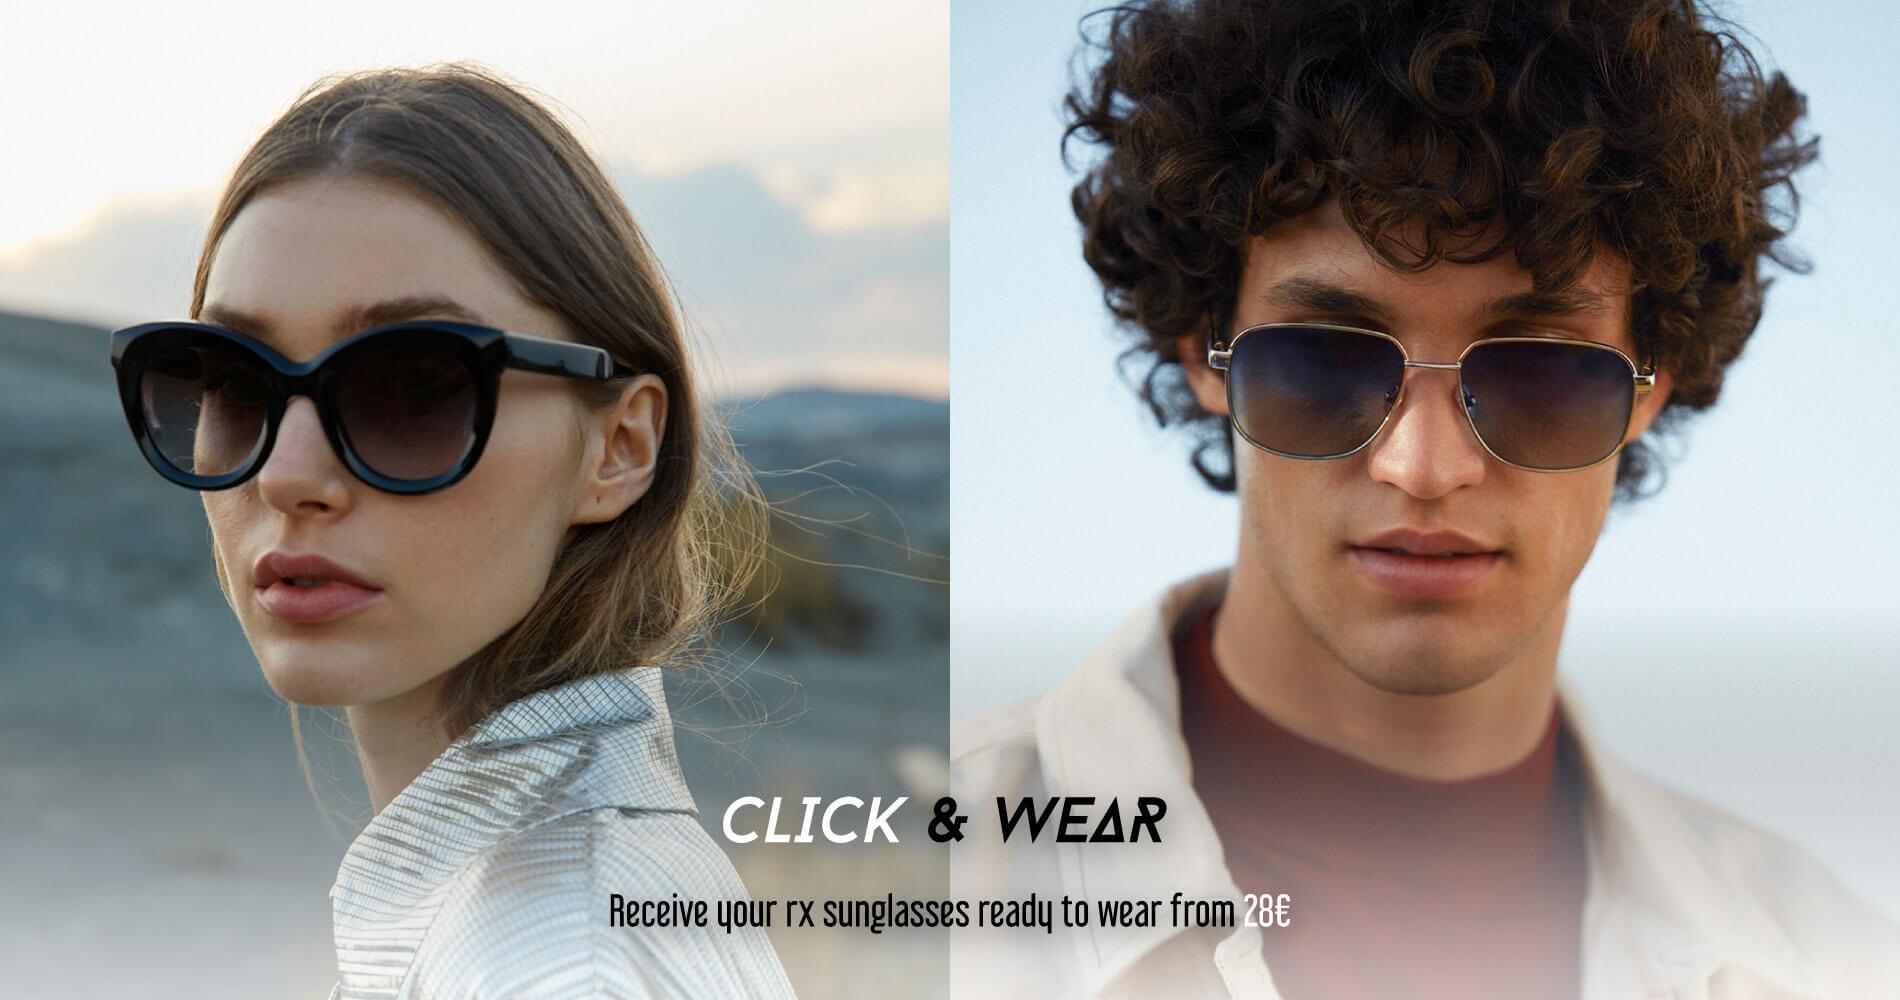 Click & Wear